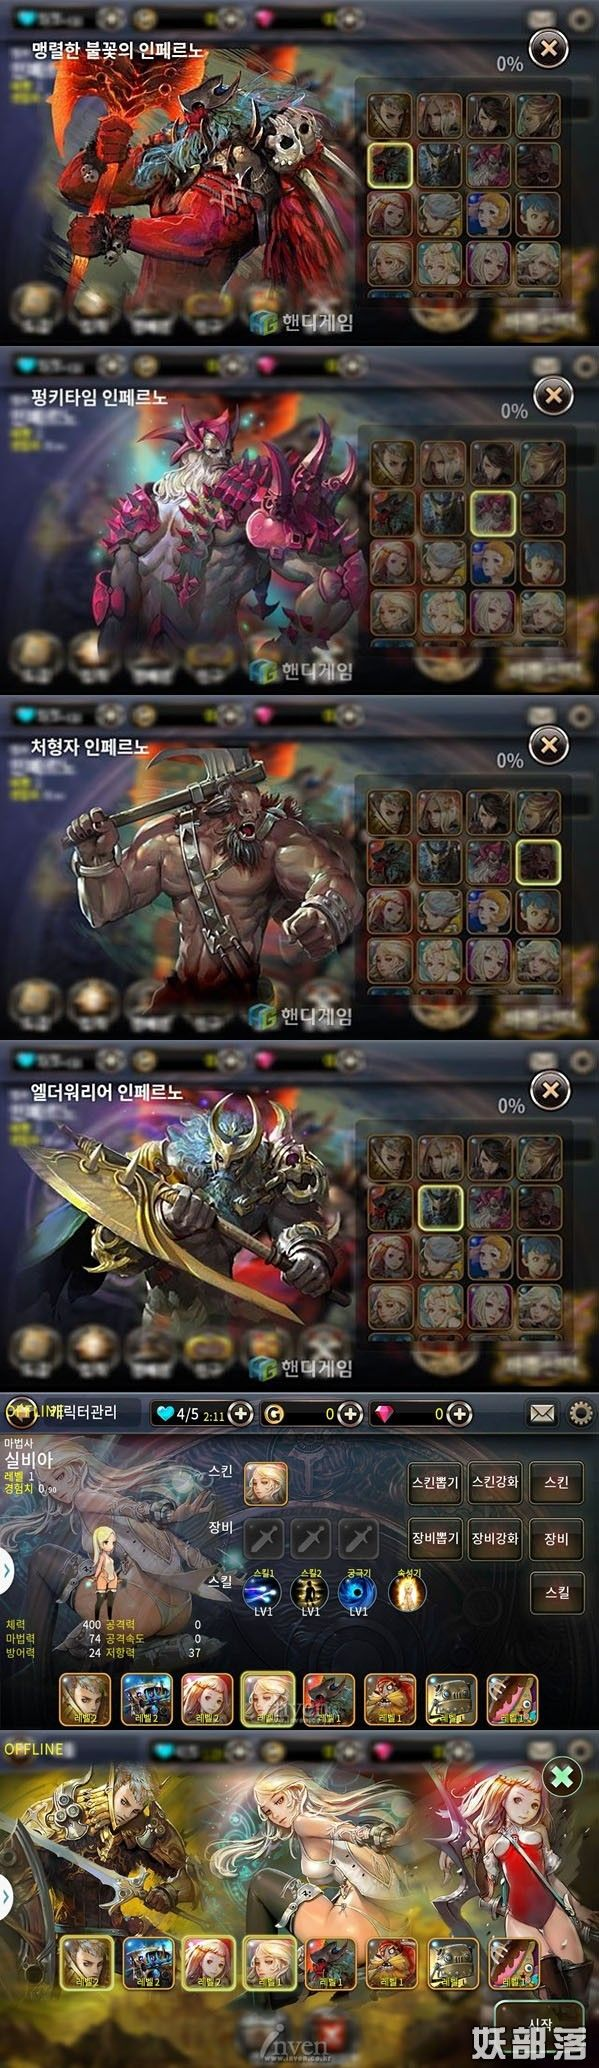 战争联盟battle league - ...